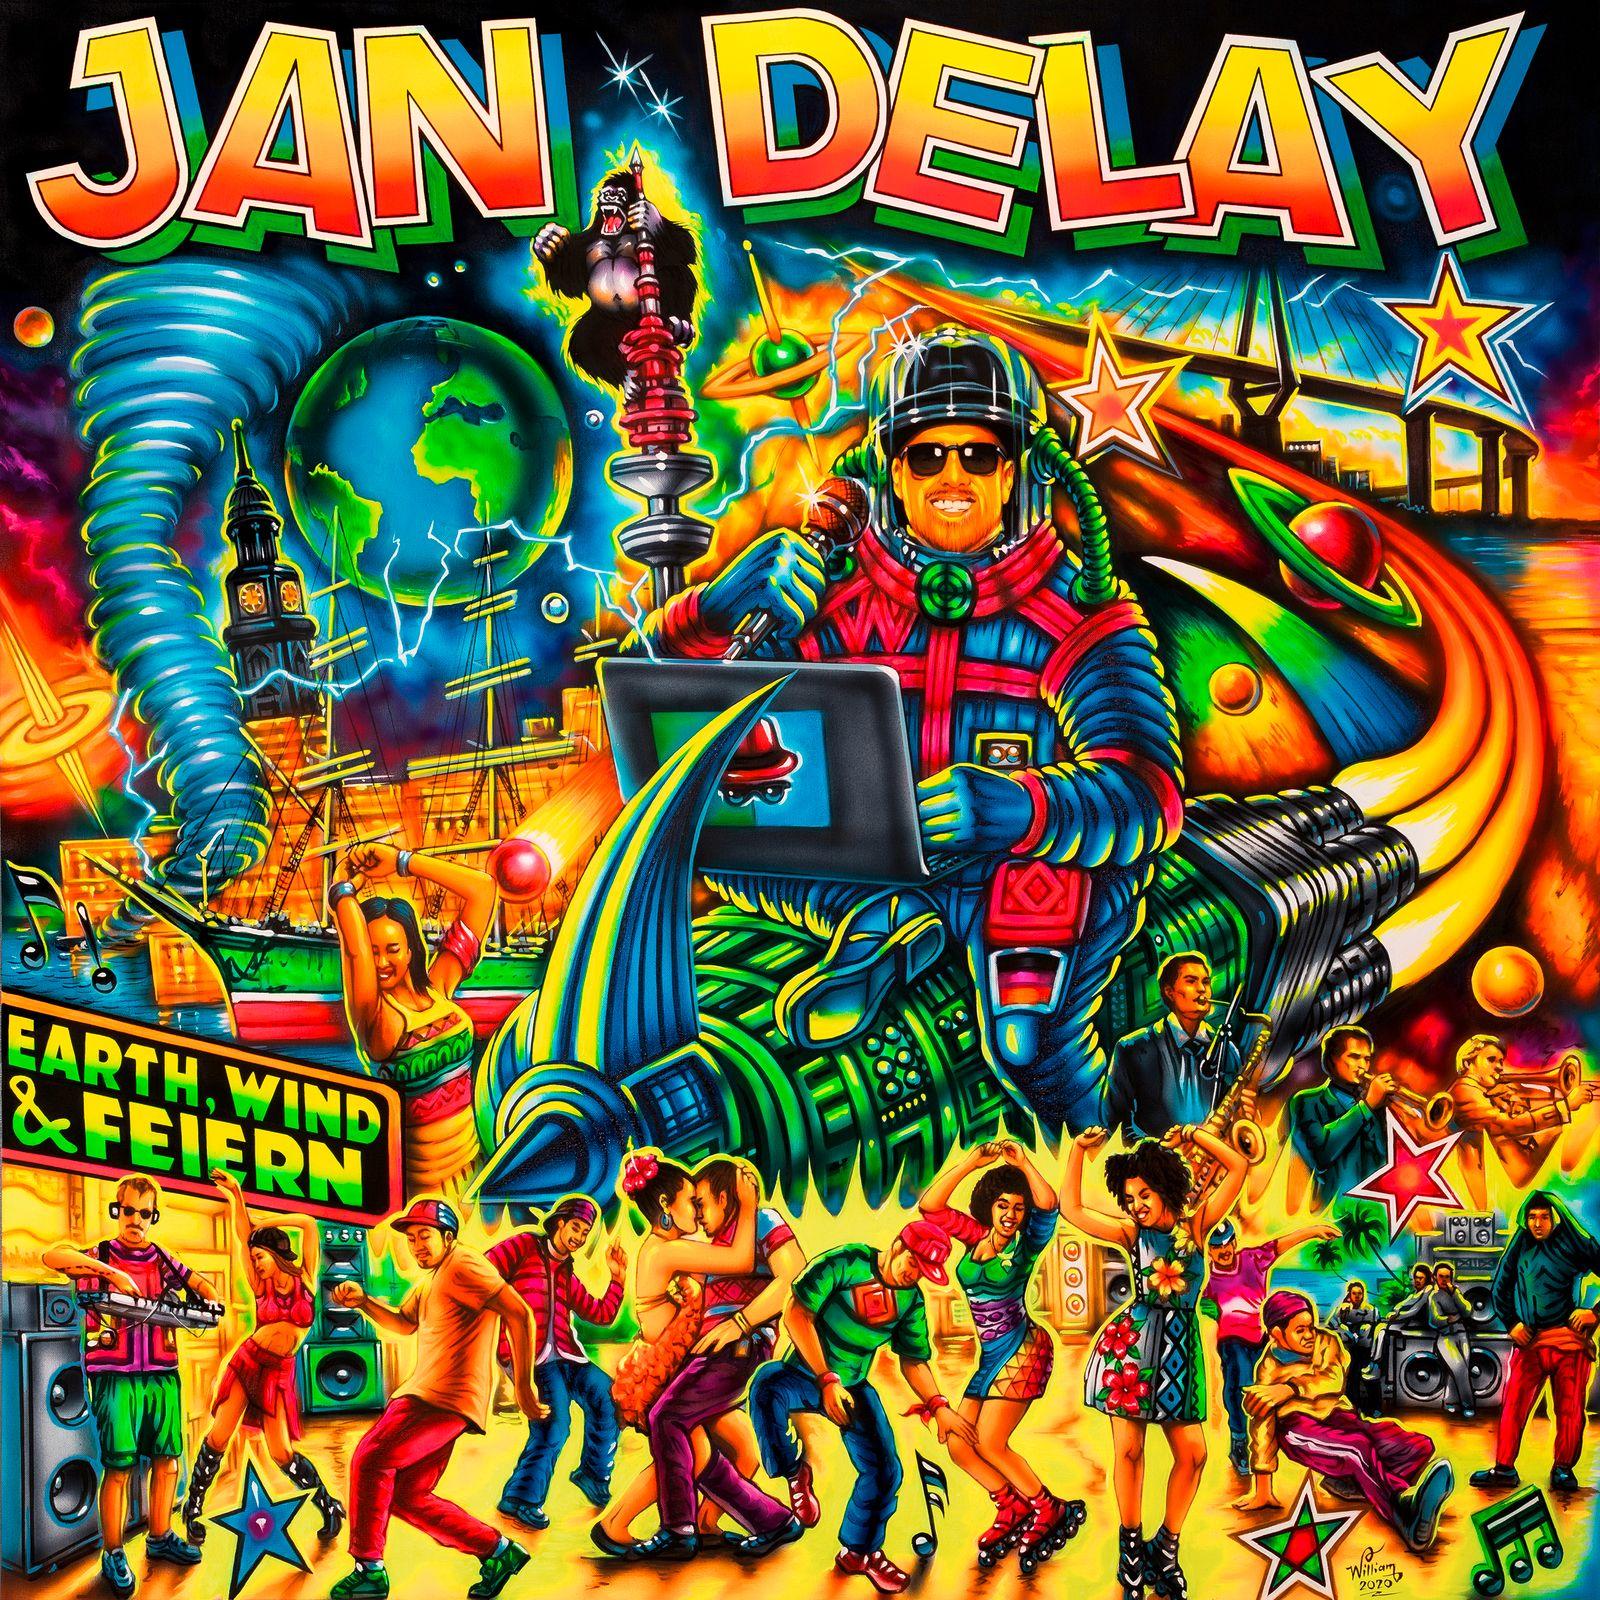 Jan Delay: Earth, Wind & Feiern COVER